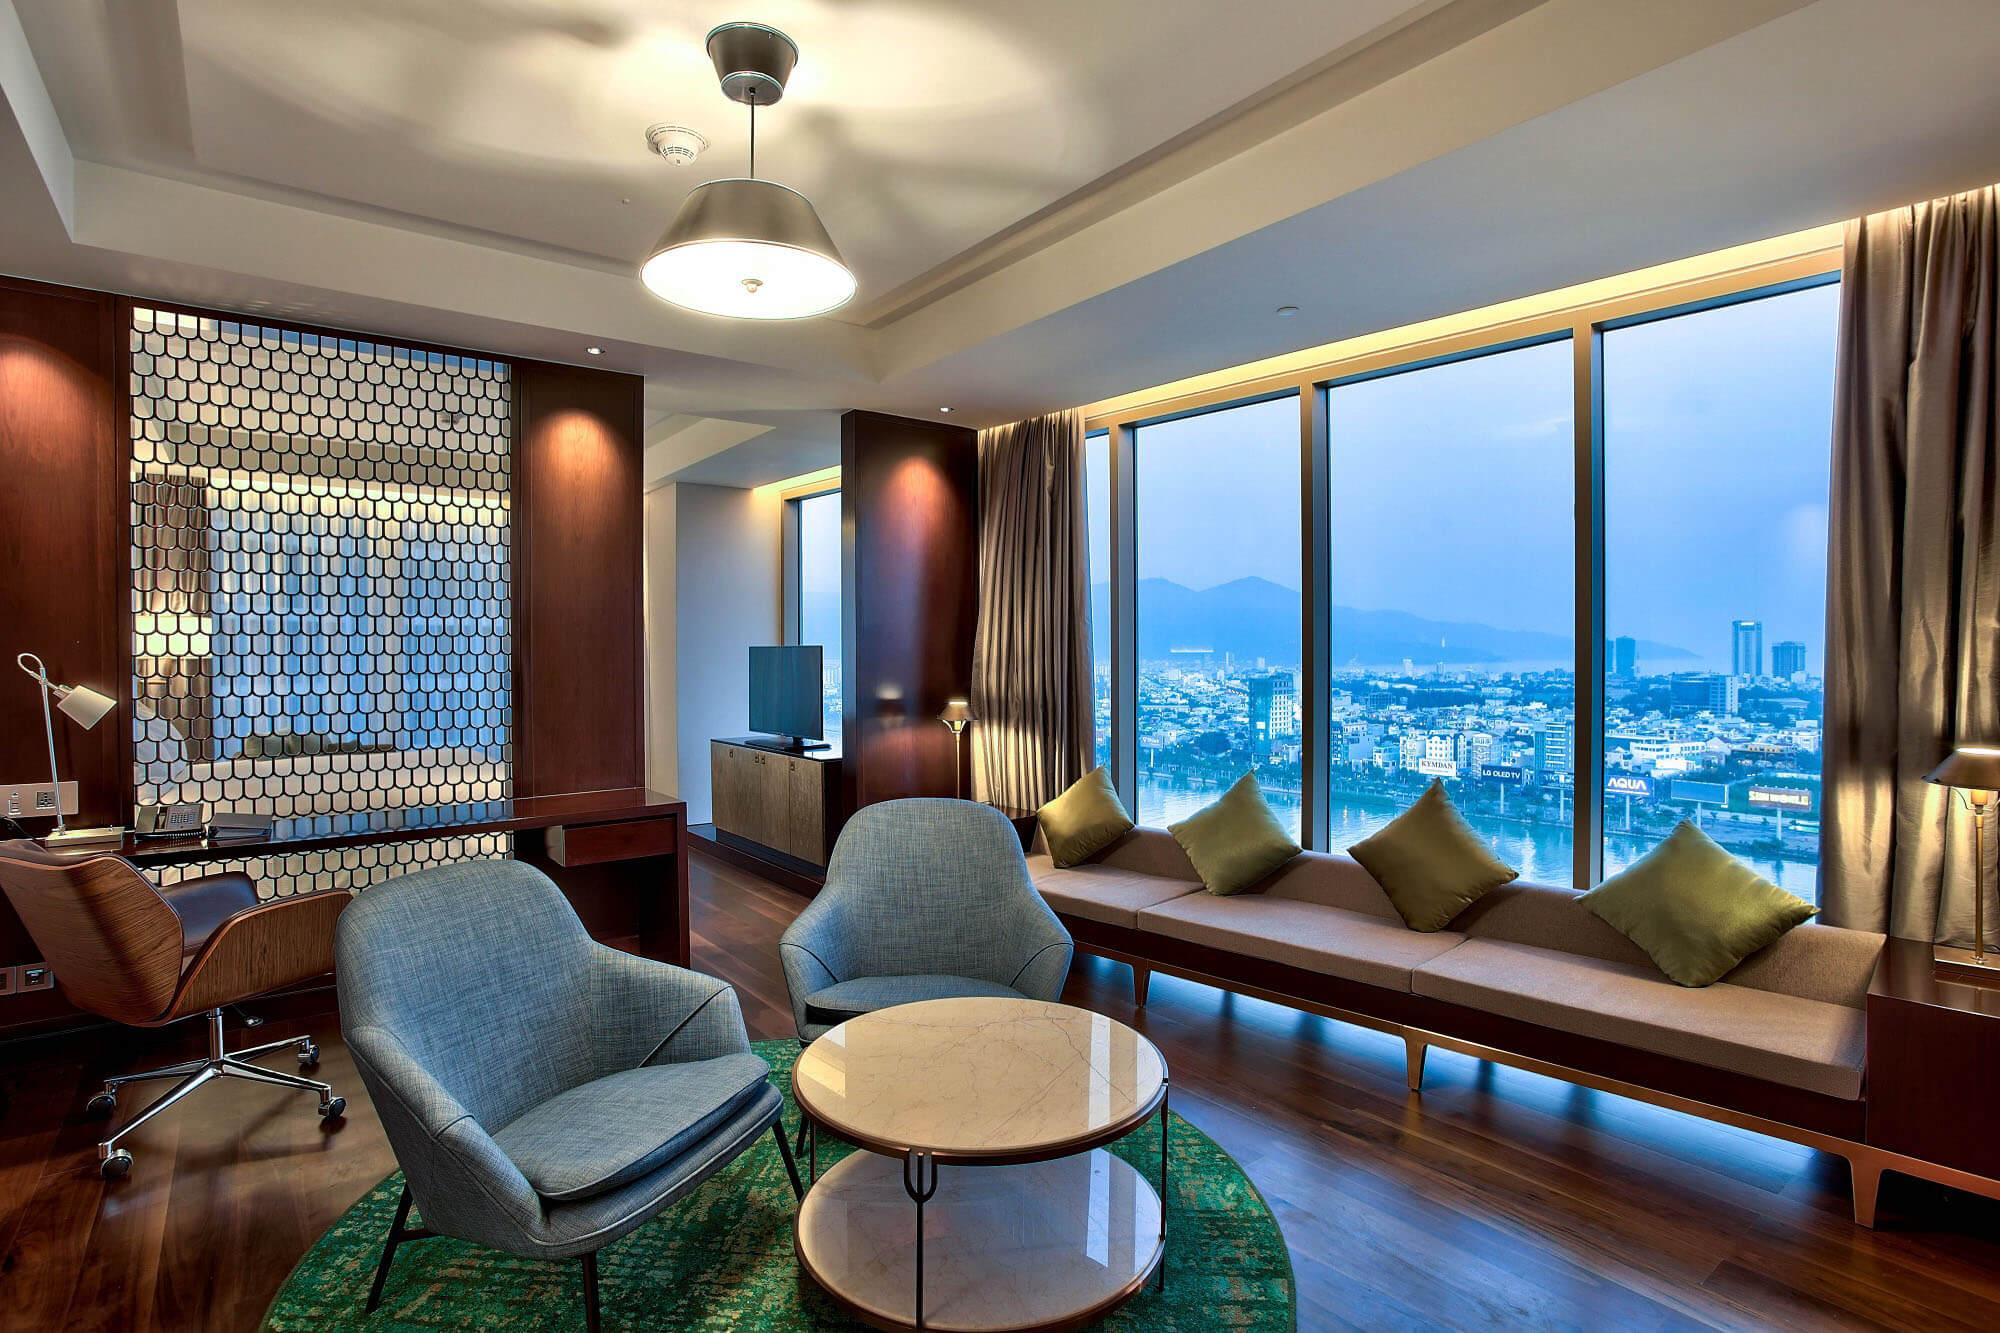 Suite Room Hilton Da Nang Trai Nghiem Khach San Day Phong Cach Giua Long Thanh Pho Danang Fantasticity 01